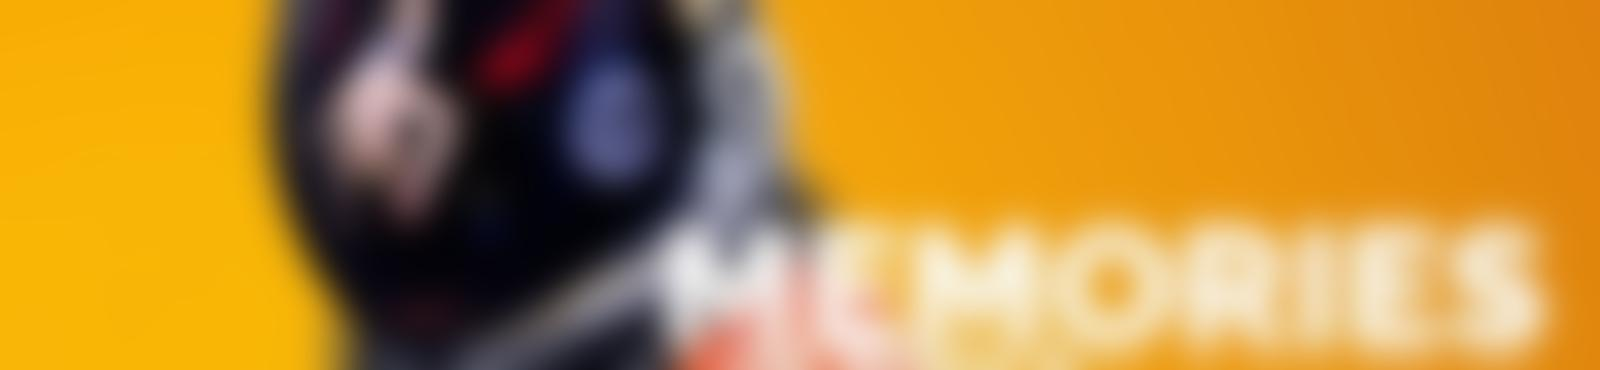 Blurred c6958016 9f99 4c4a ab0e 93bc5be61074